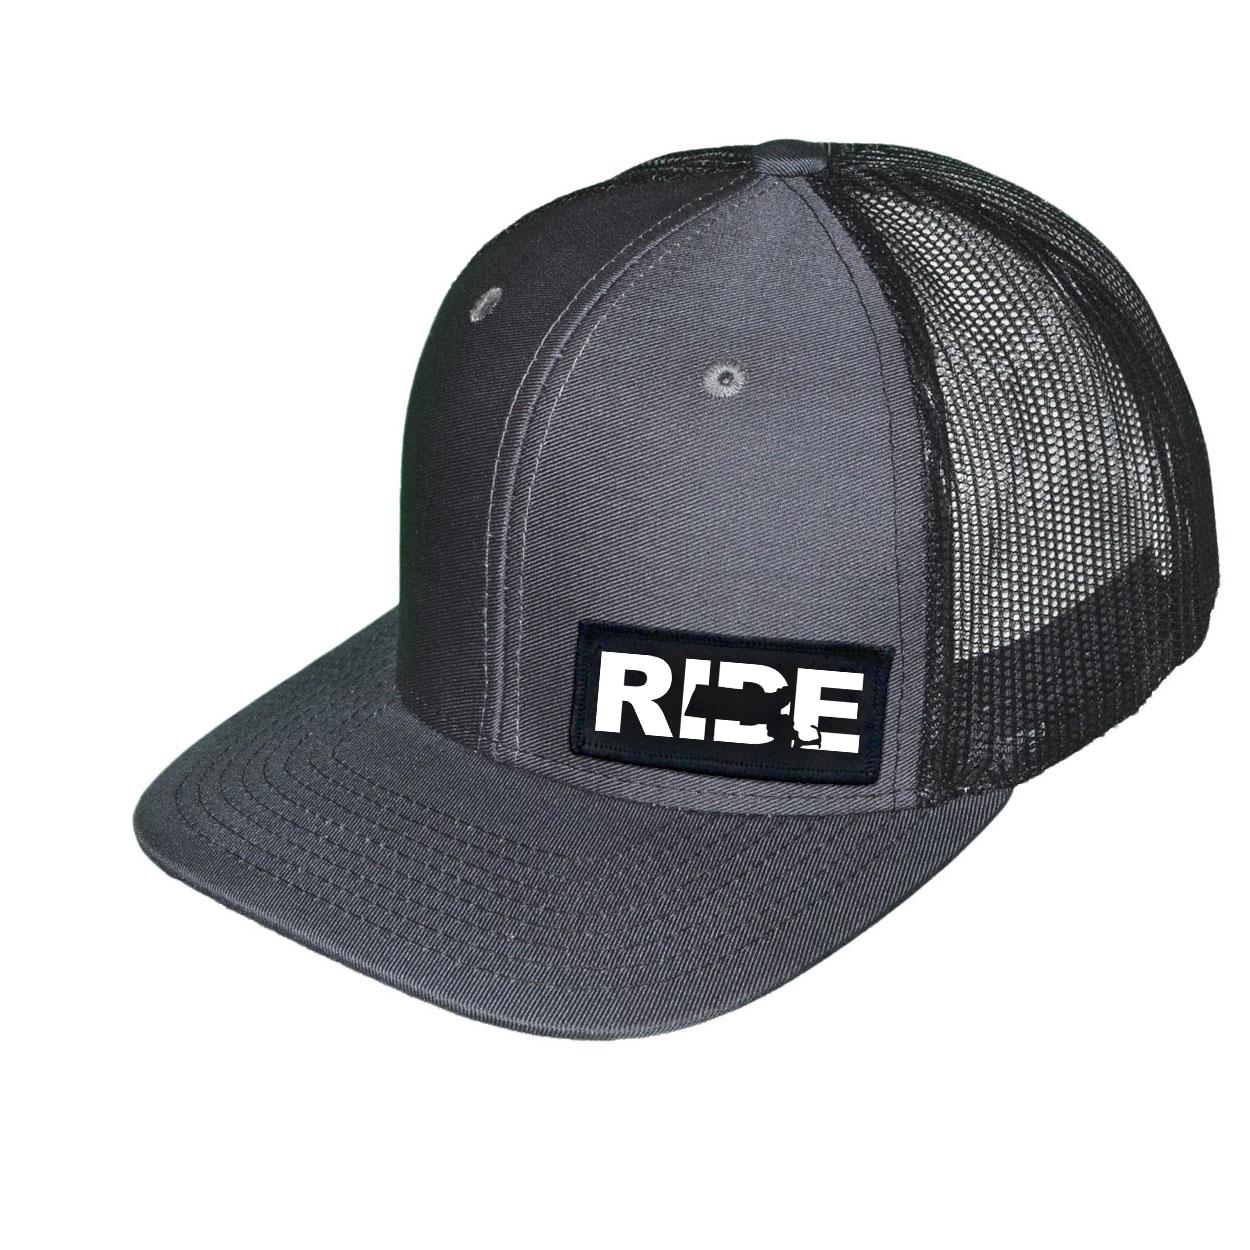 Ride Massachusetts Night Out Woven Patch Snapback Trucker Hat Dark Gray/Black (White Logo)